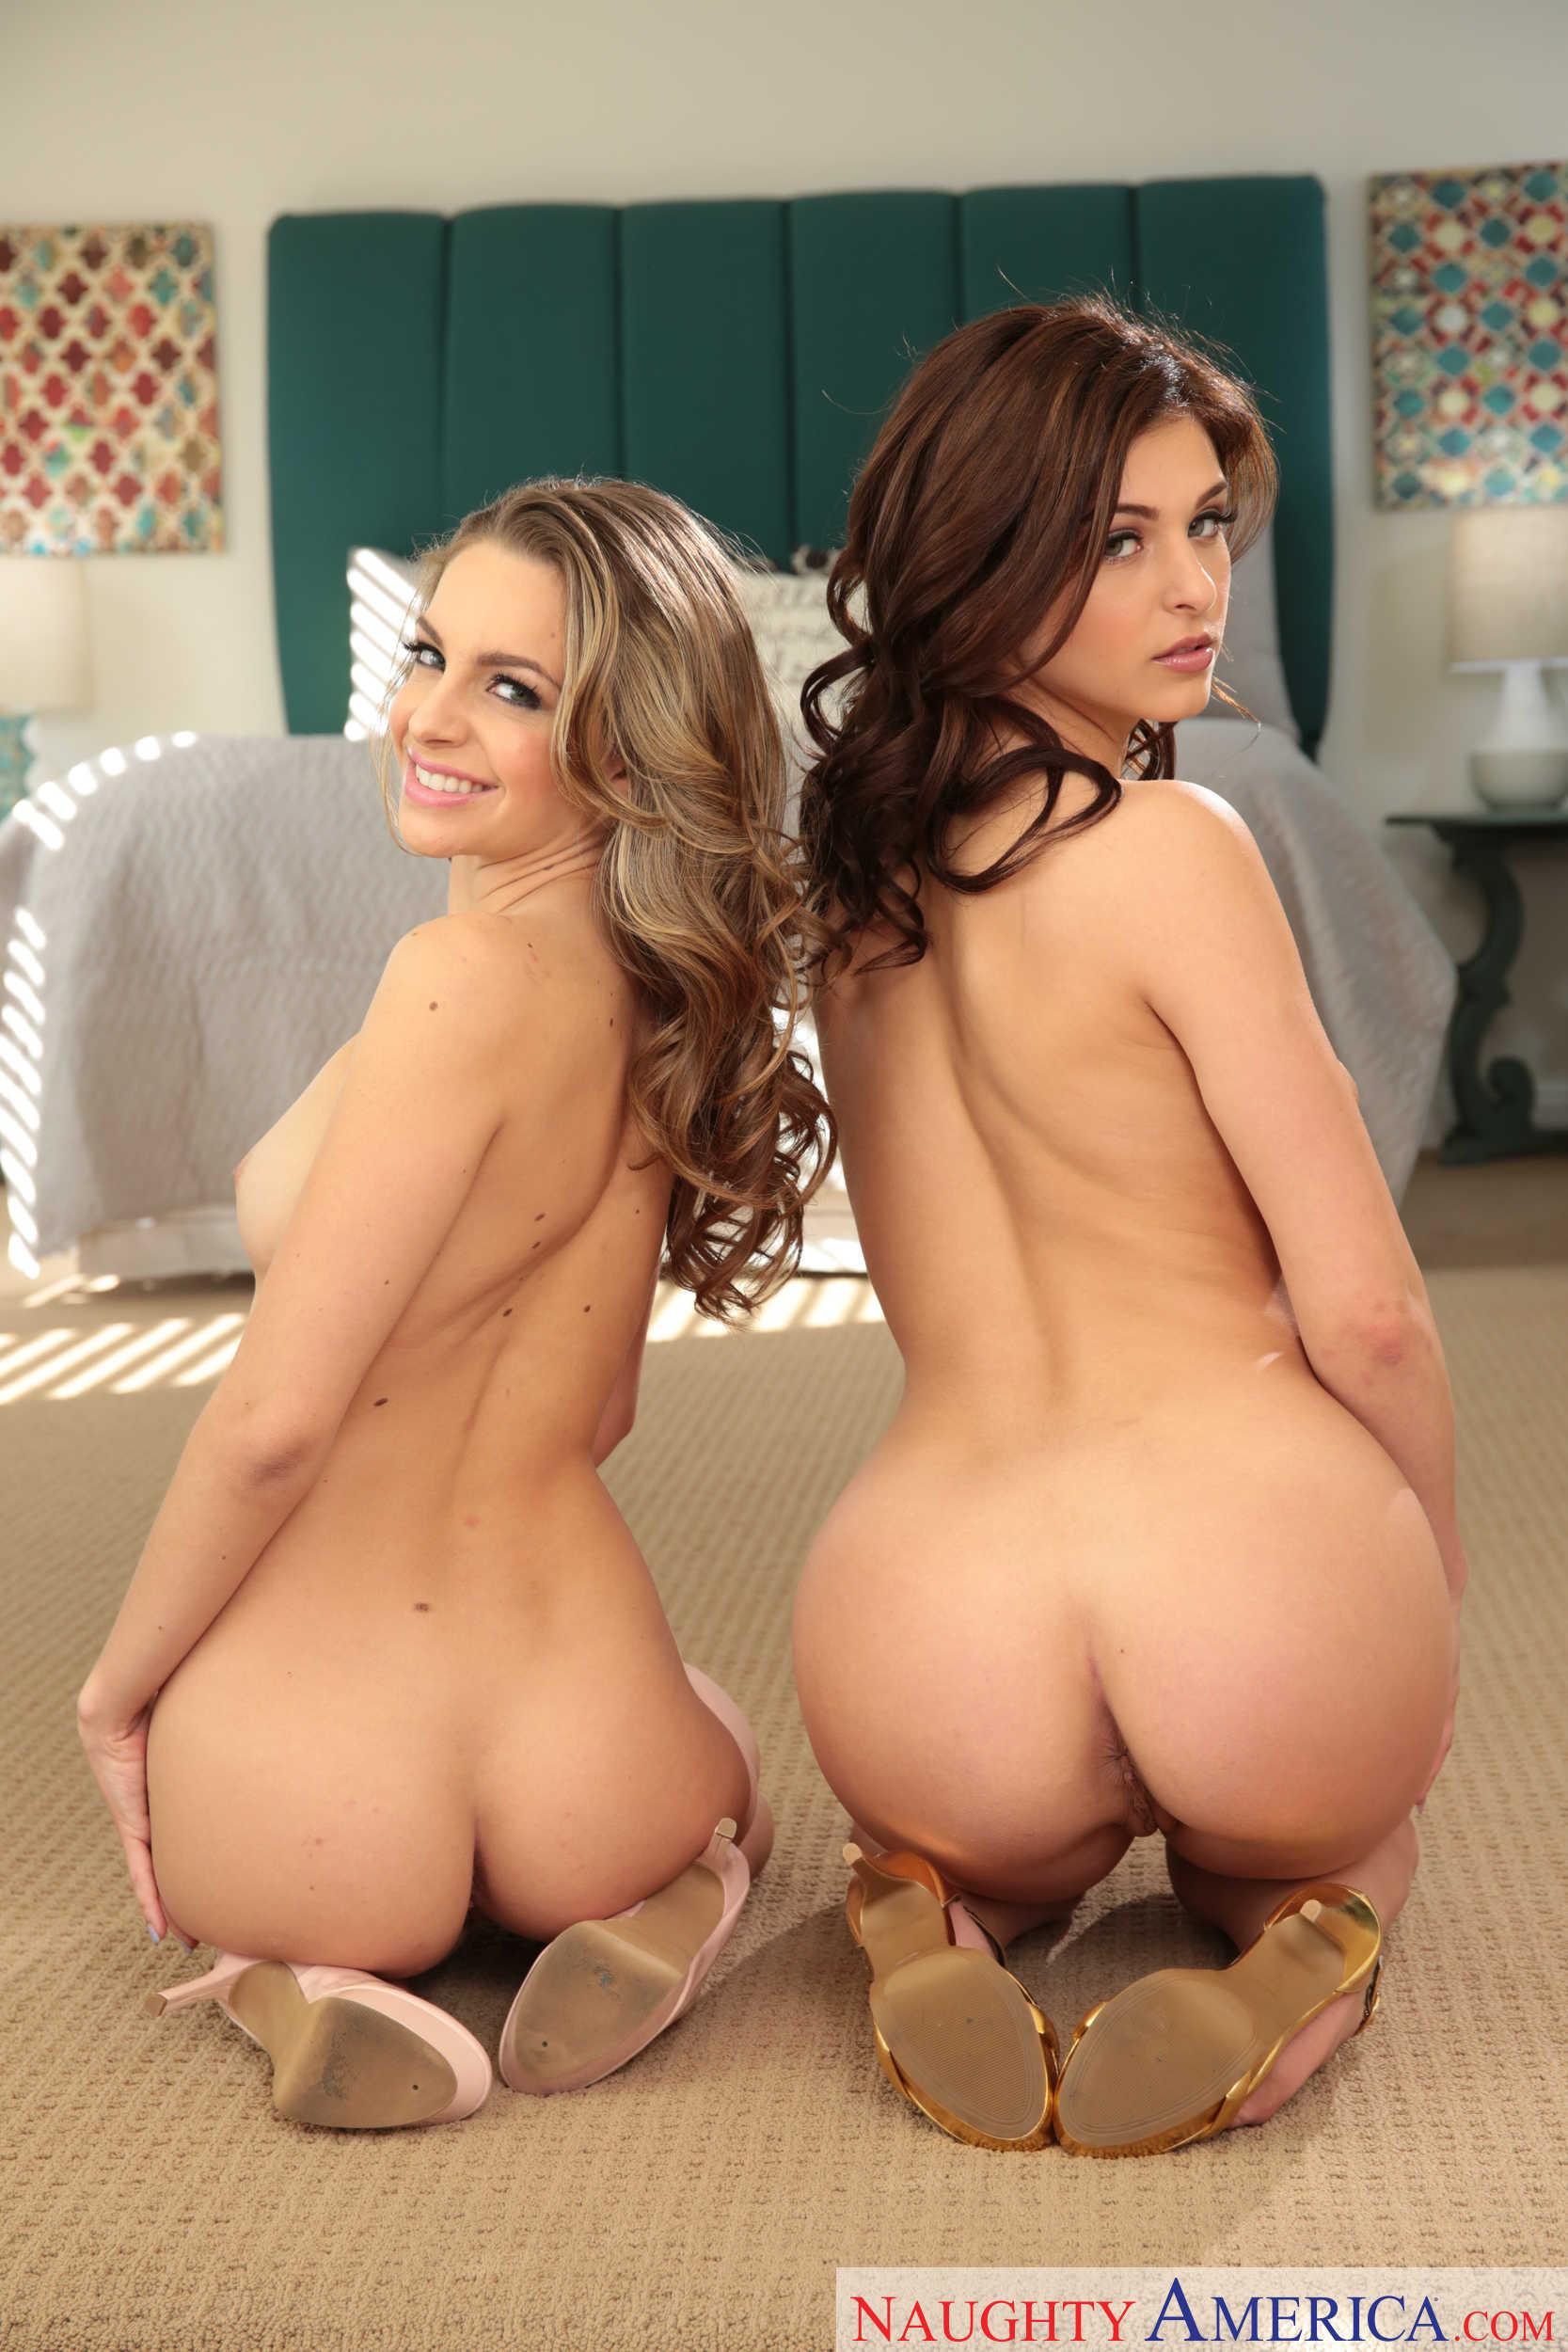 Leah Gotti y Kimmy Granger muestran sus conchitas juntas